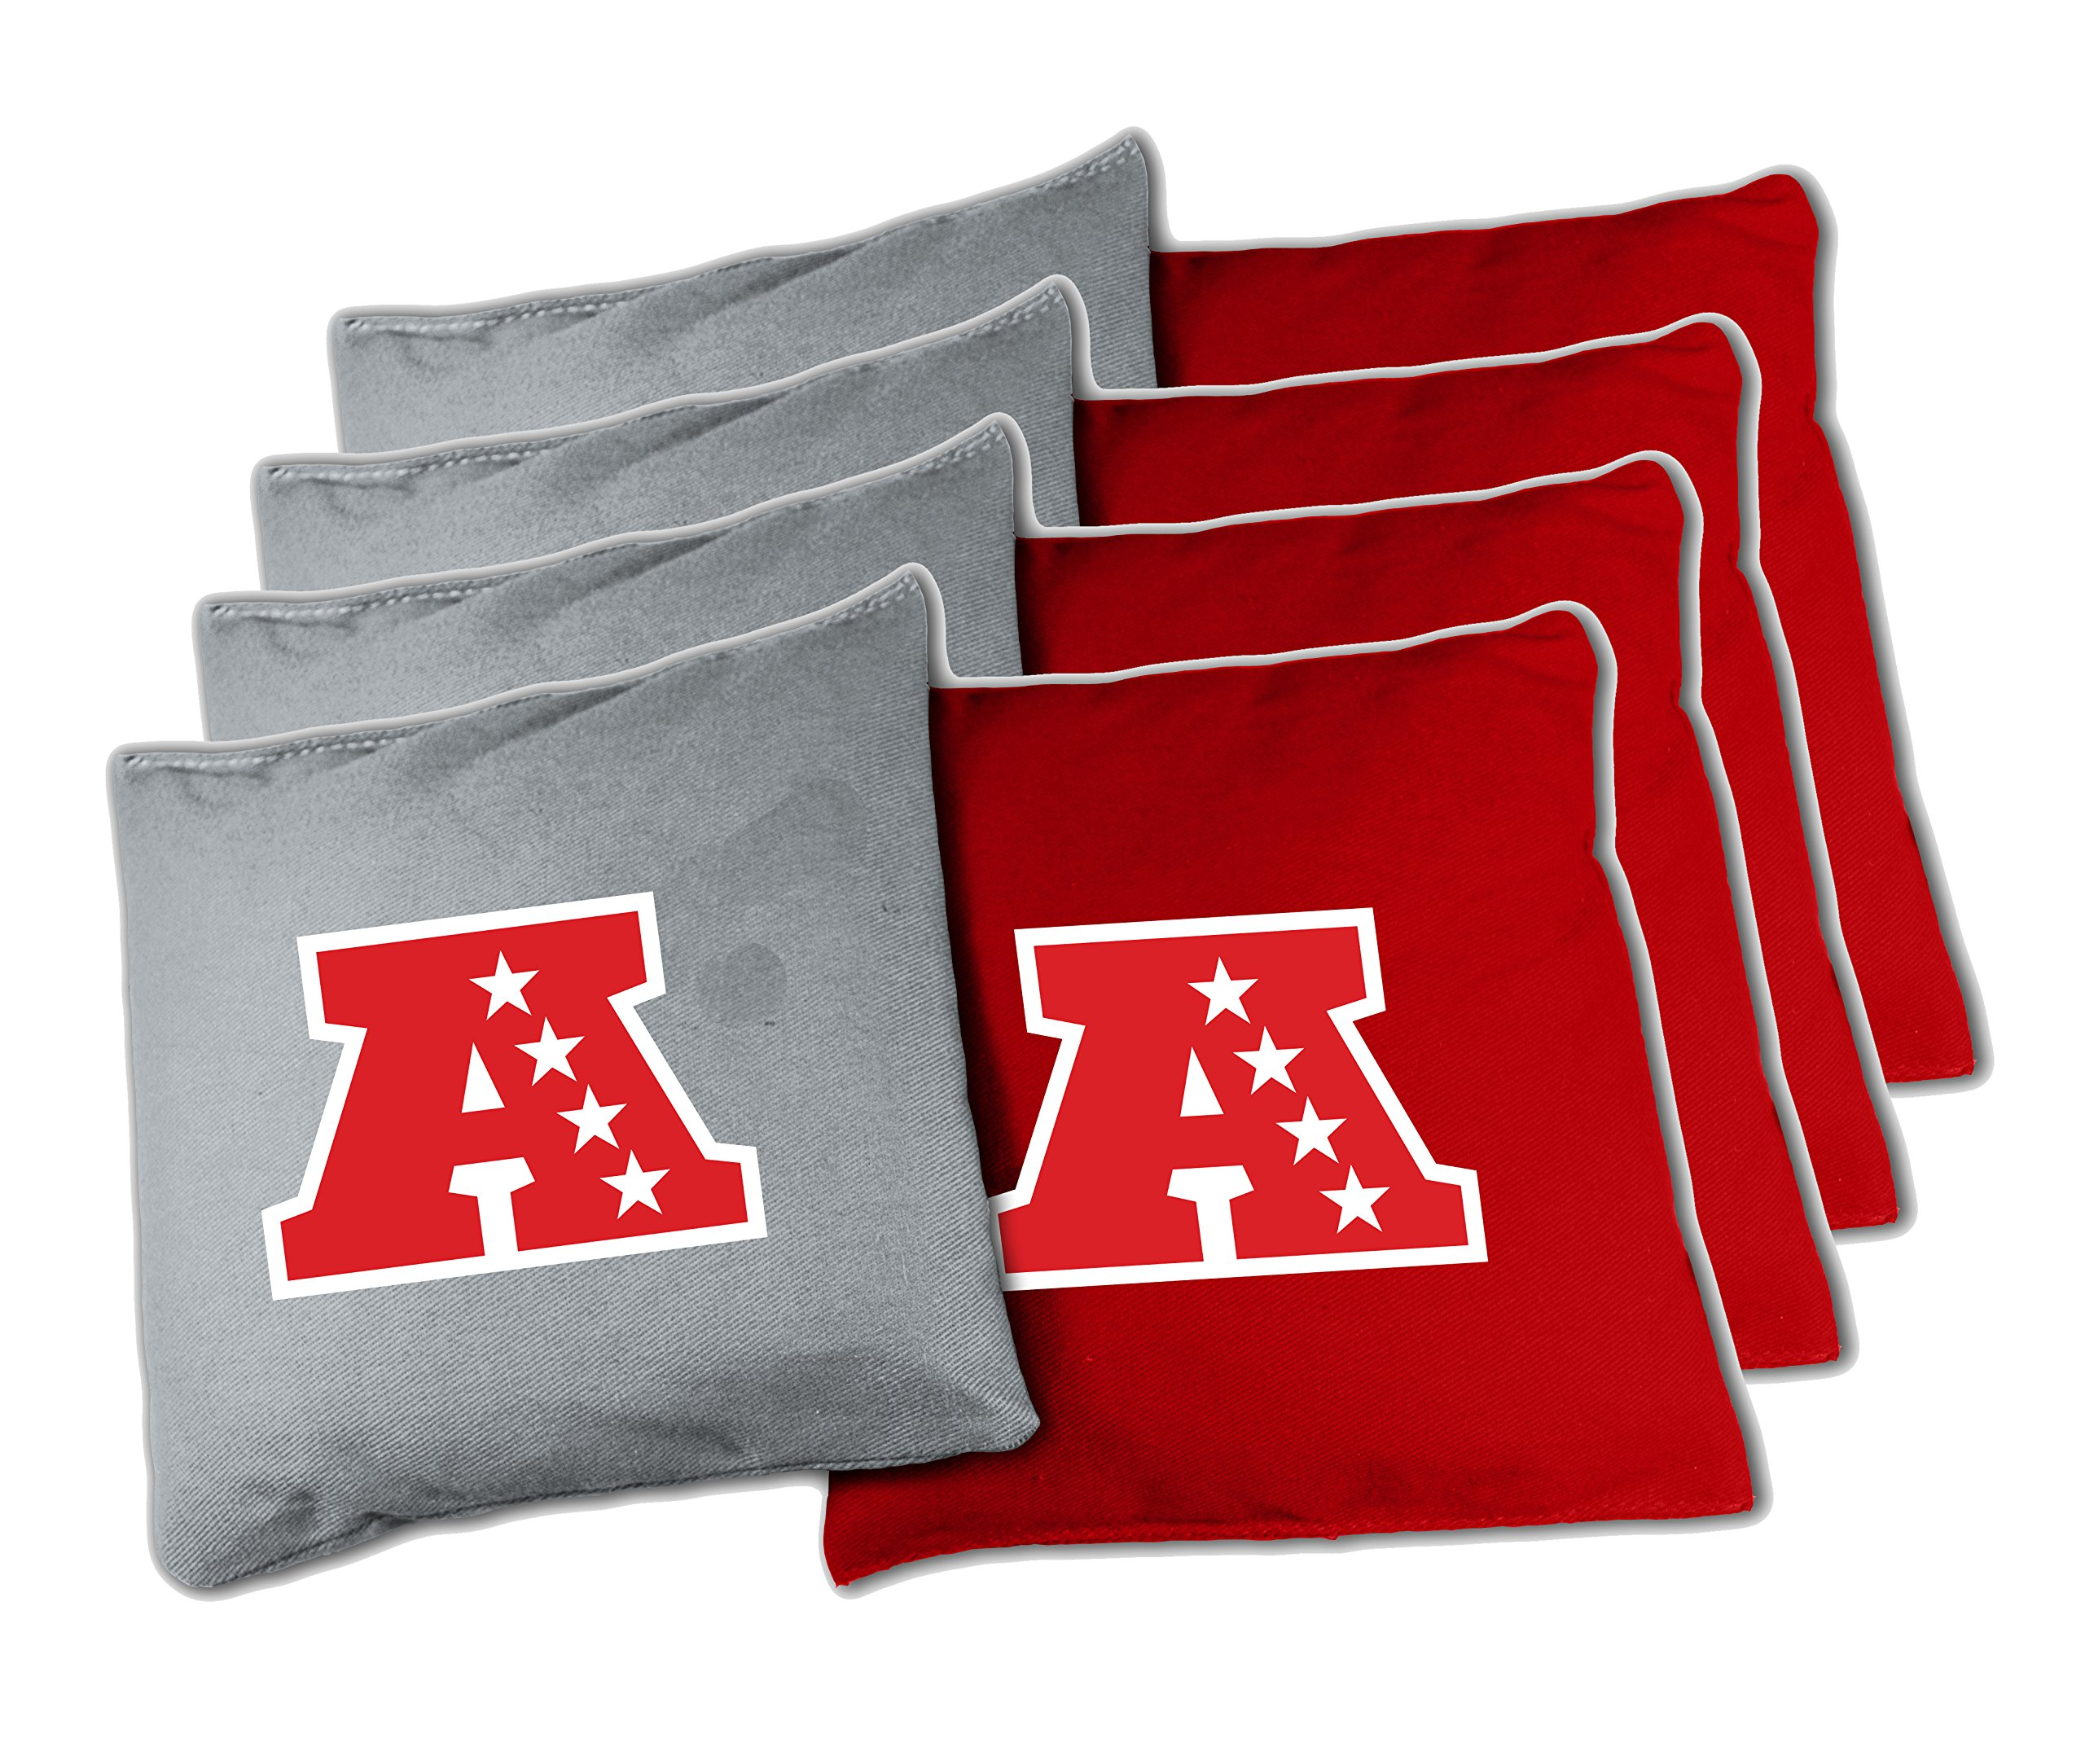 Wild Sports Regulation All-weather AFC Cornhole Bean Bags